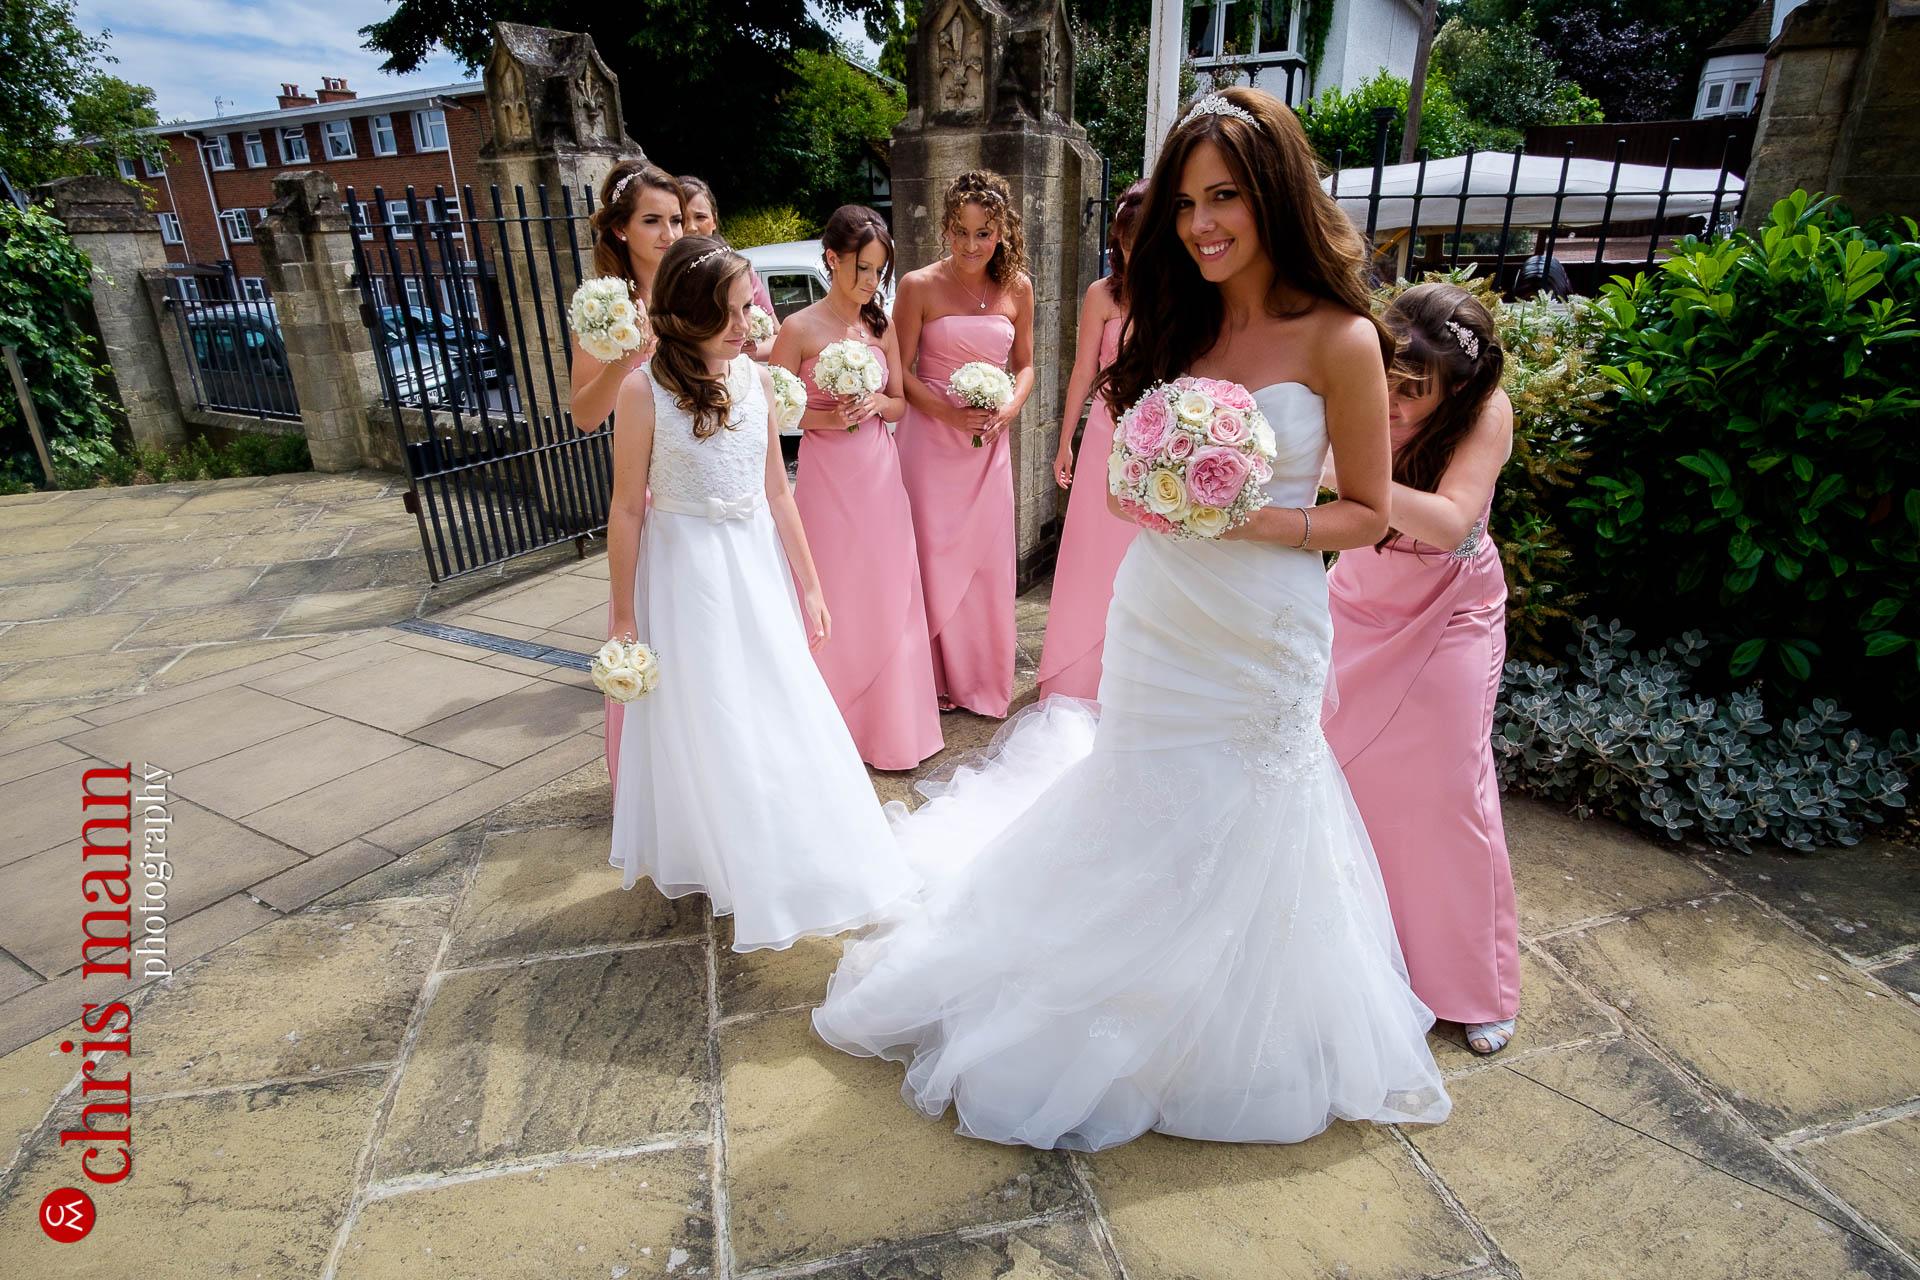 Brocket-Hall-wedding-photography-010